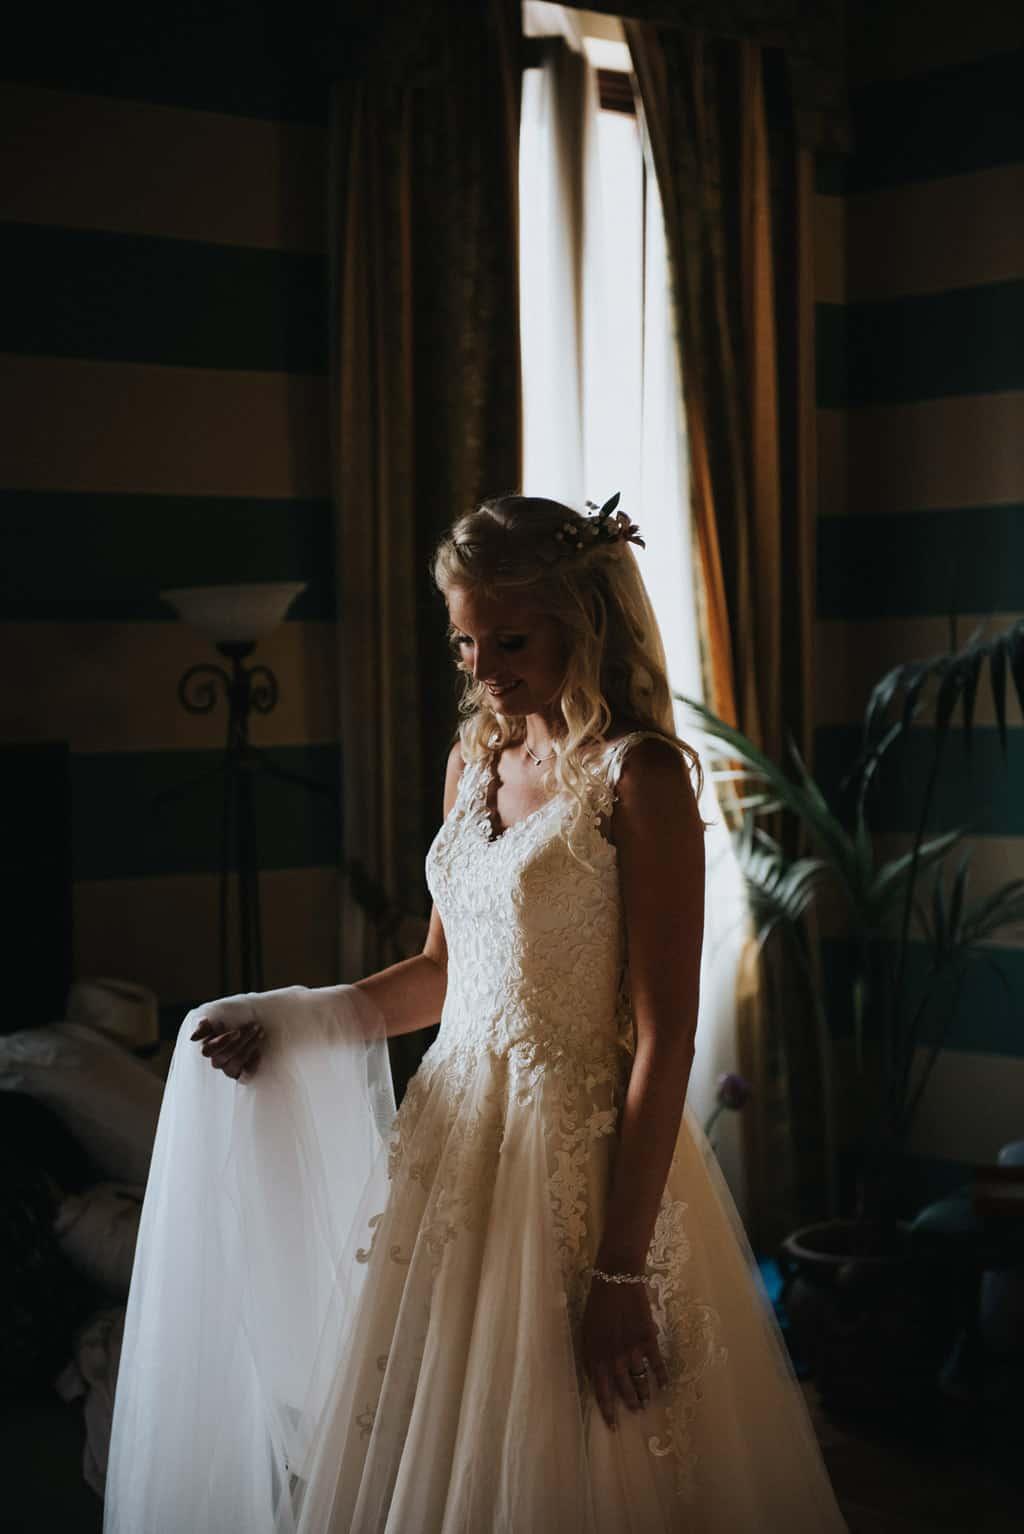 750 wedding photographer verona Da Monaco alla Valpolicella   matrimonio Villa Cariola